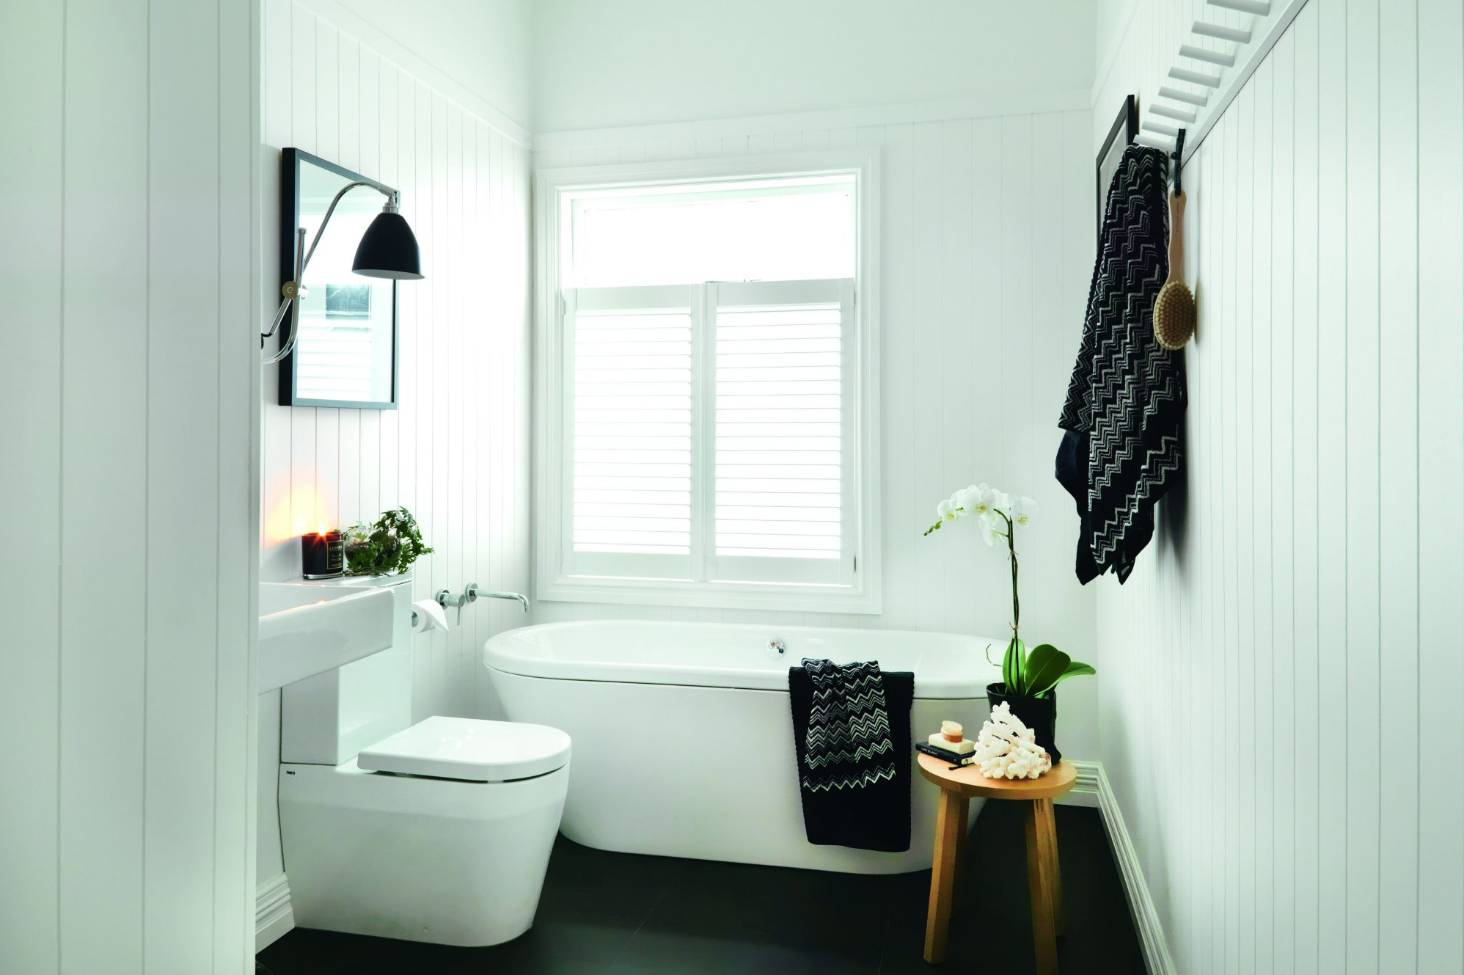 Ten Common Bathroom Renovation Mistakes | Stuff.co.nz